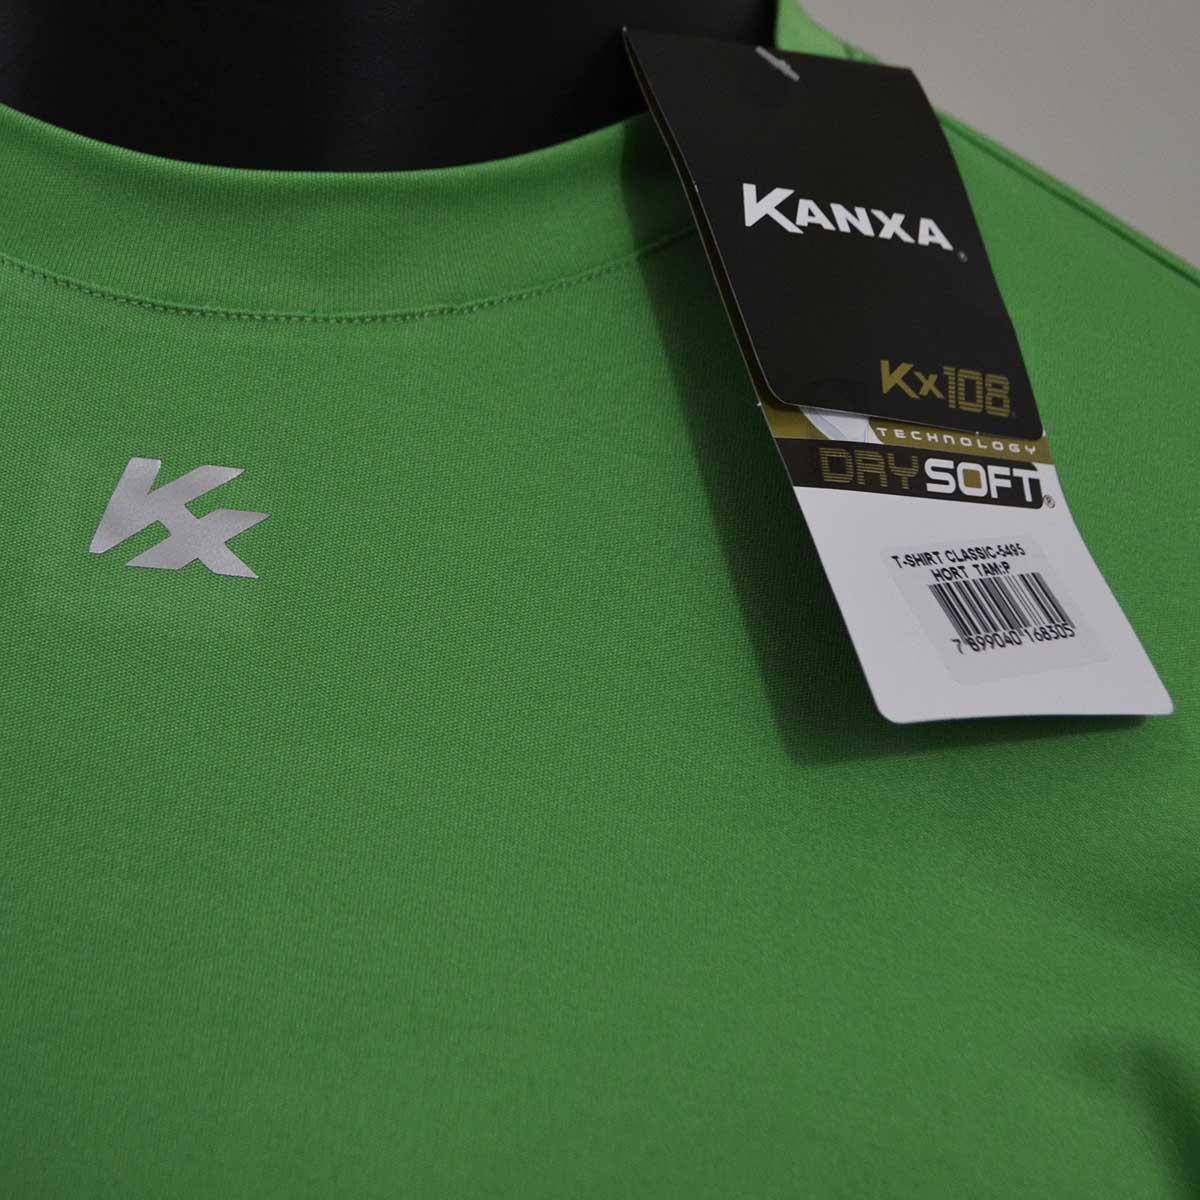 Camiseta Kanxa Classic Microfibra de Poliéster - Verde claro ... 96d6725583507